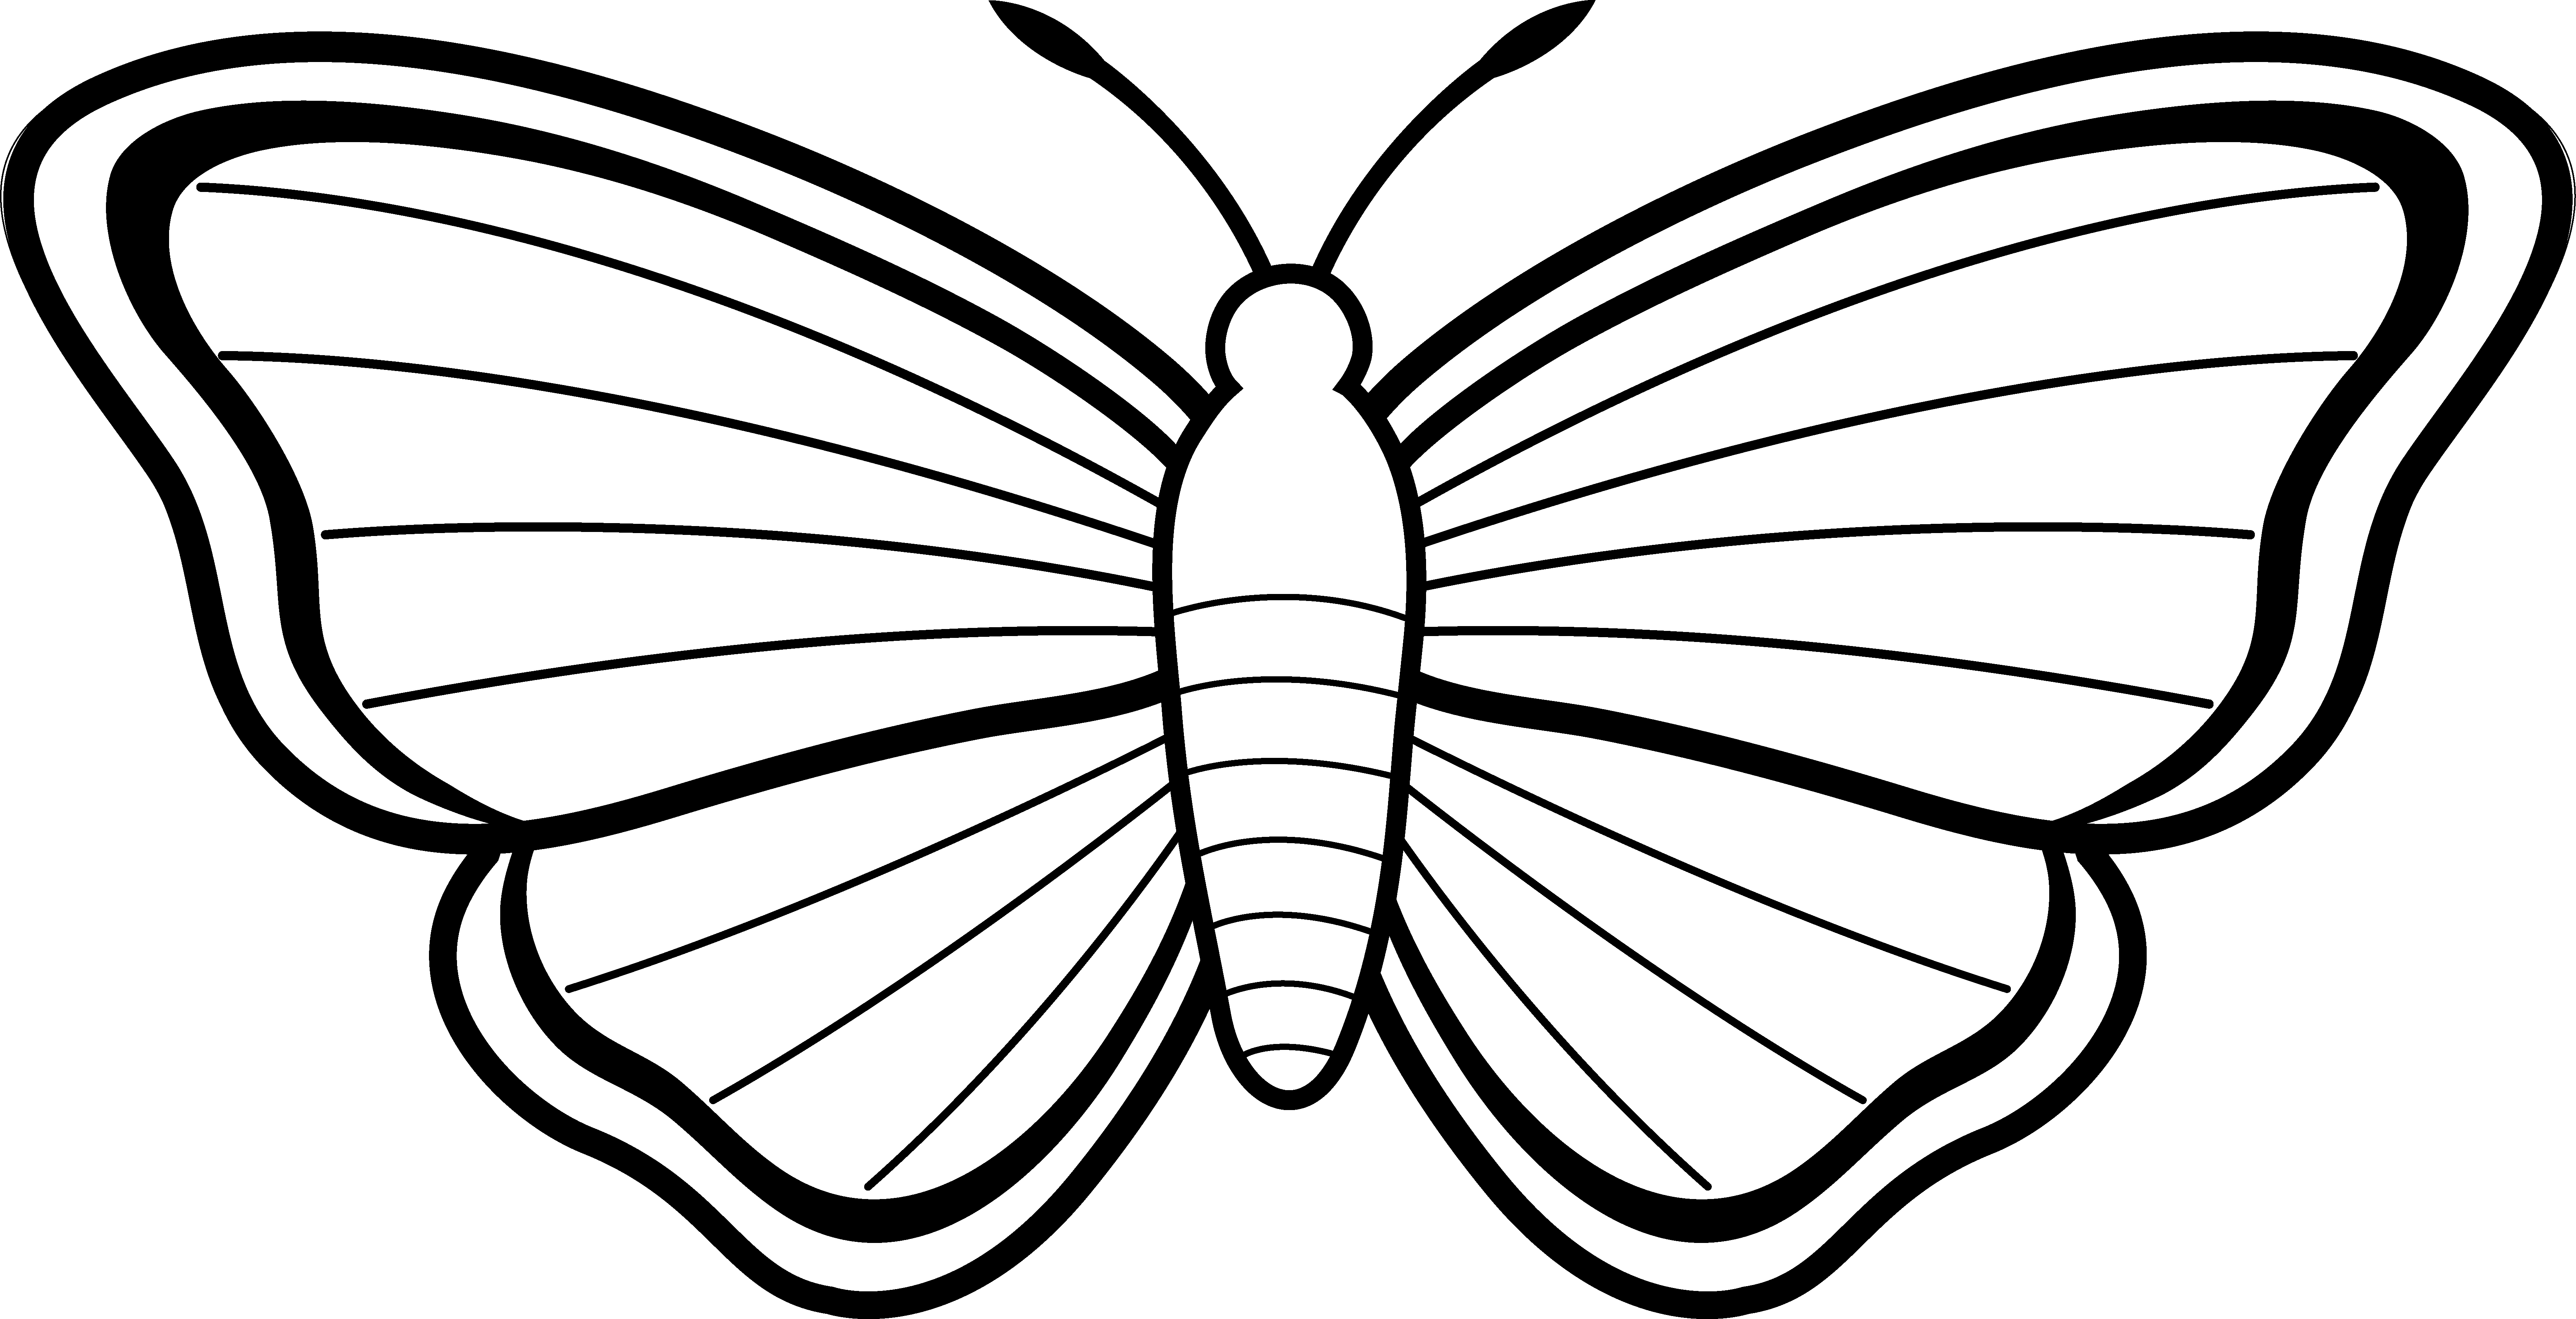 6978x3573 Black And White Moth Design